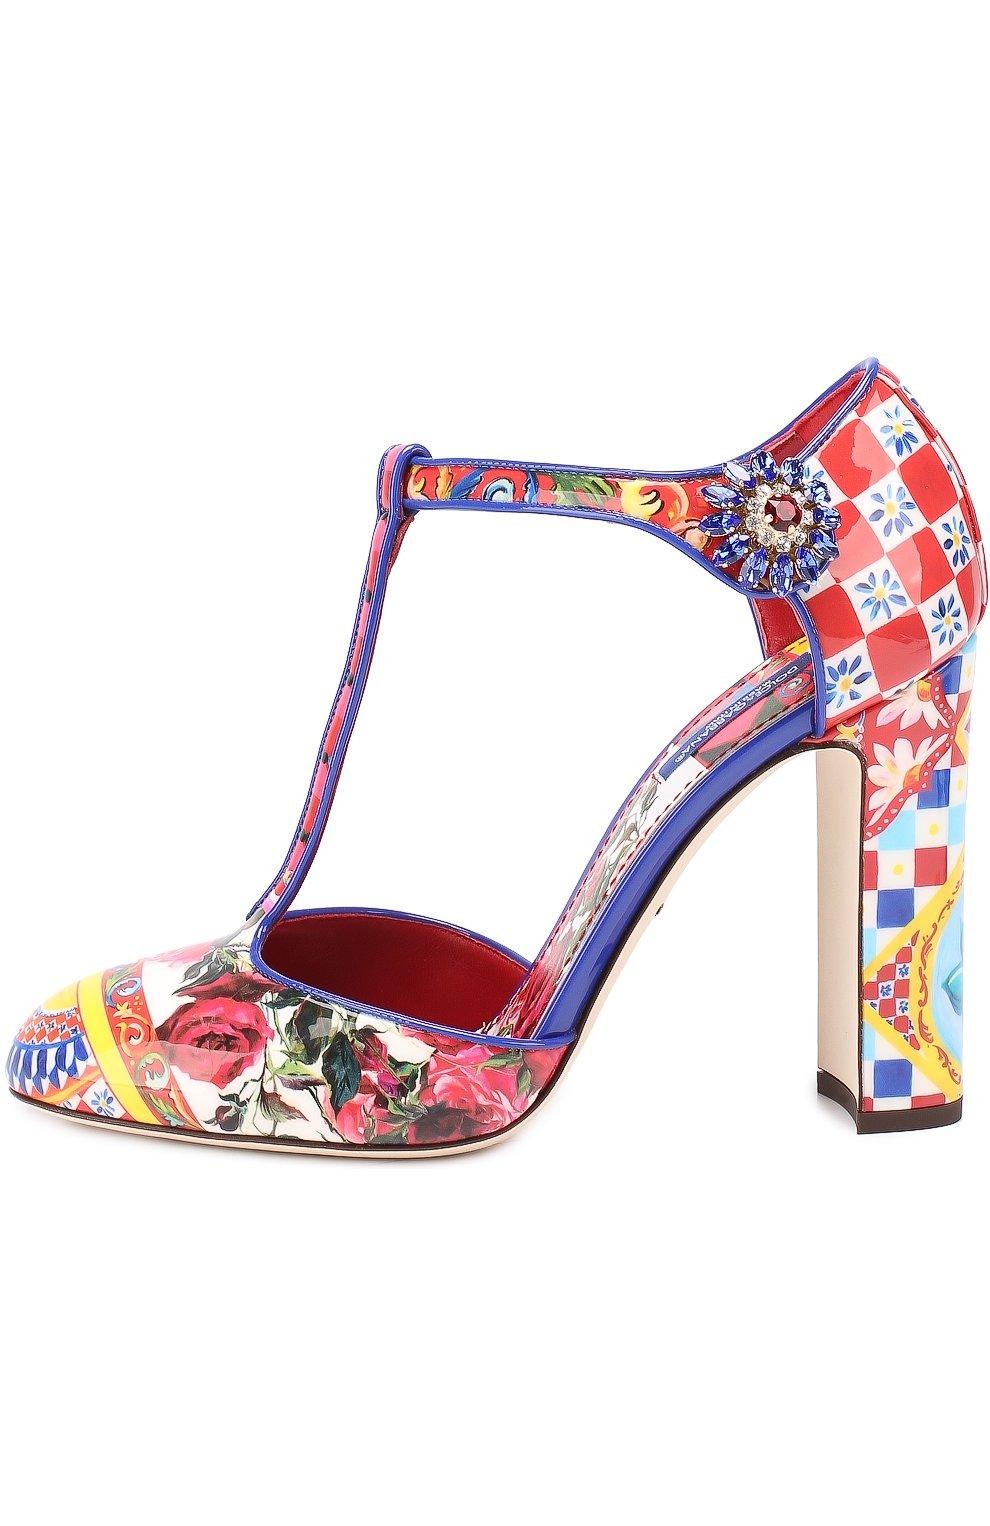 Туфли Vally с принтом на устойчивом каблуке Dolce & Gabbana разноцветные | Фото №3